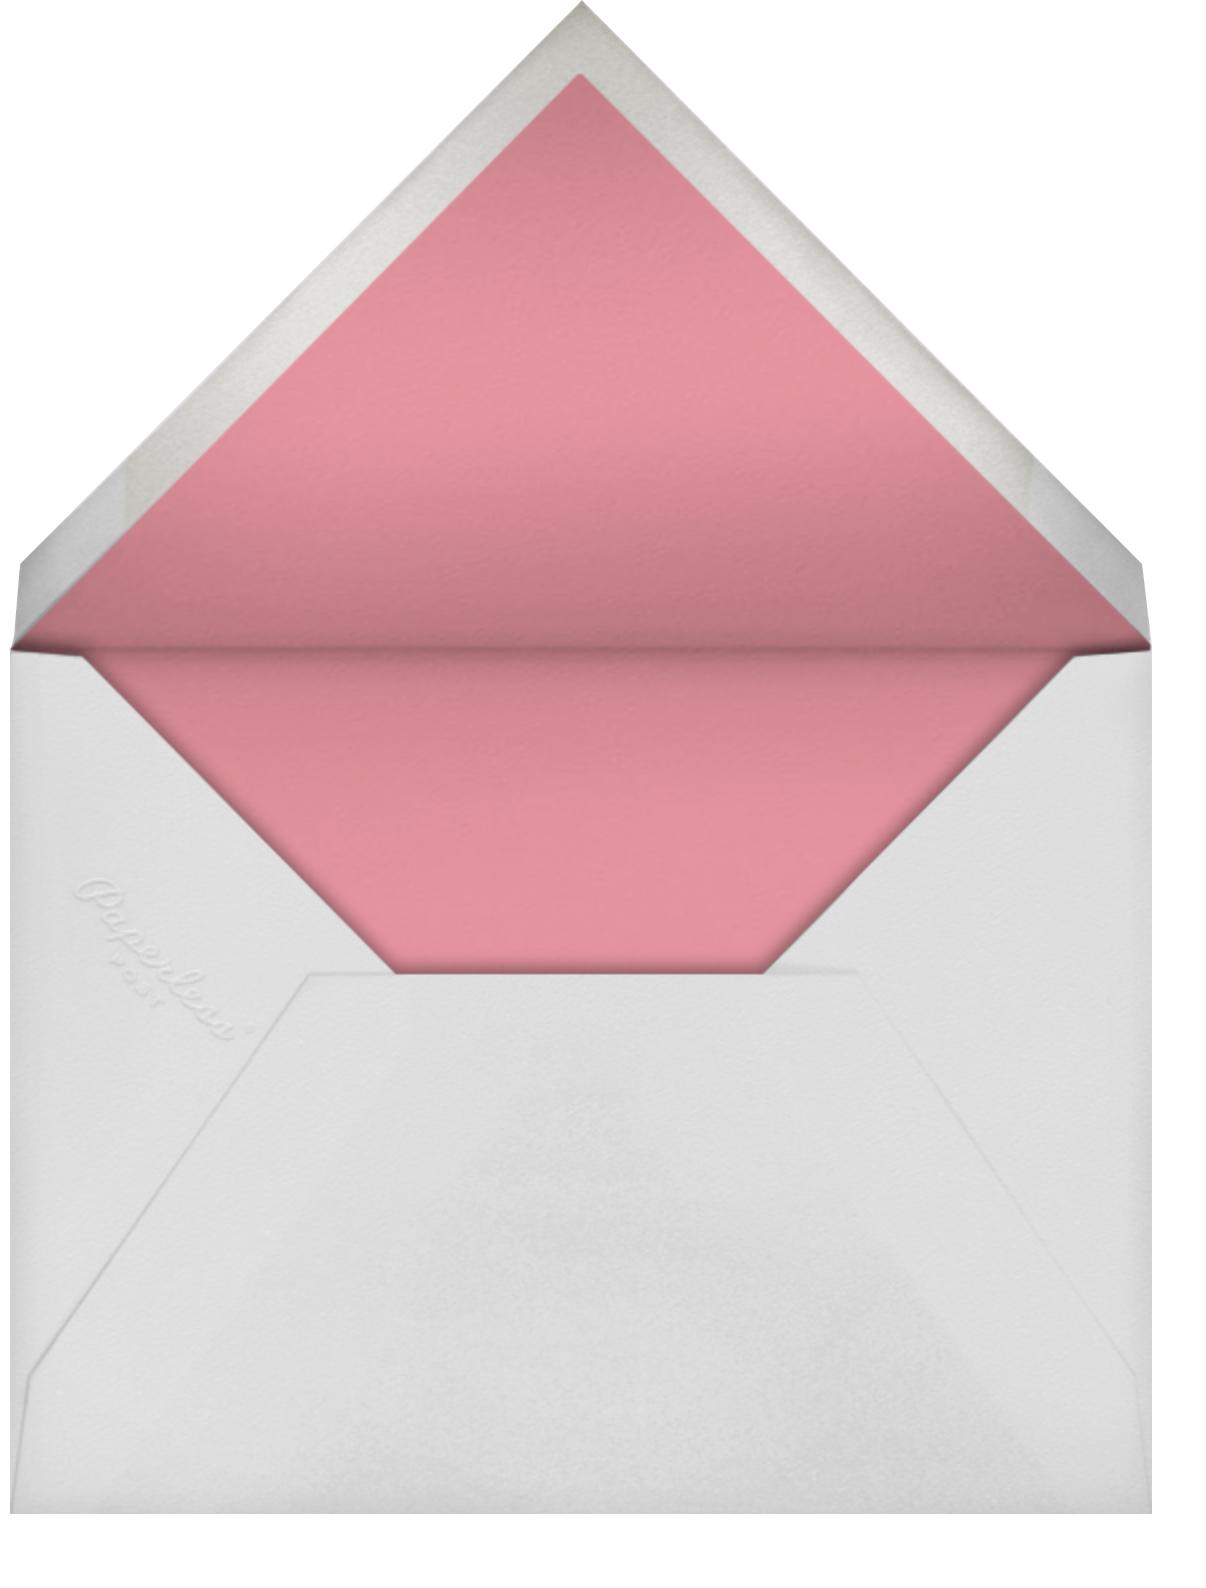 Garden Variety - Blue - kate spade new york - Envelope